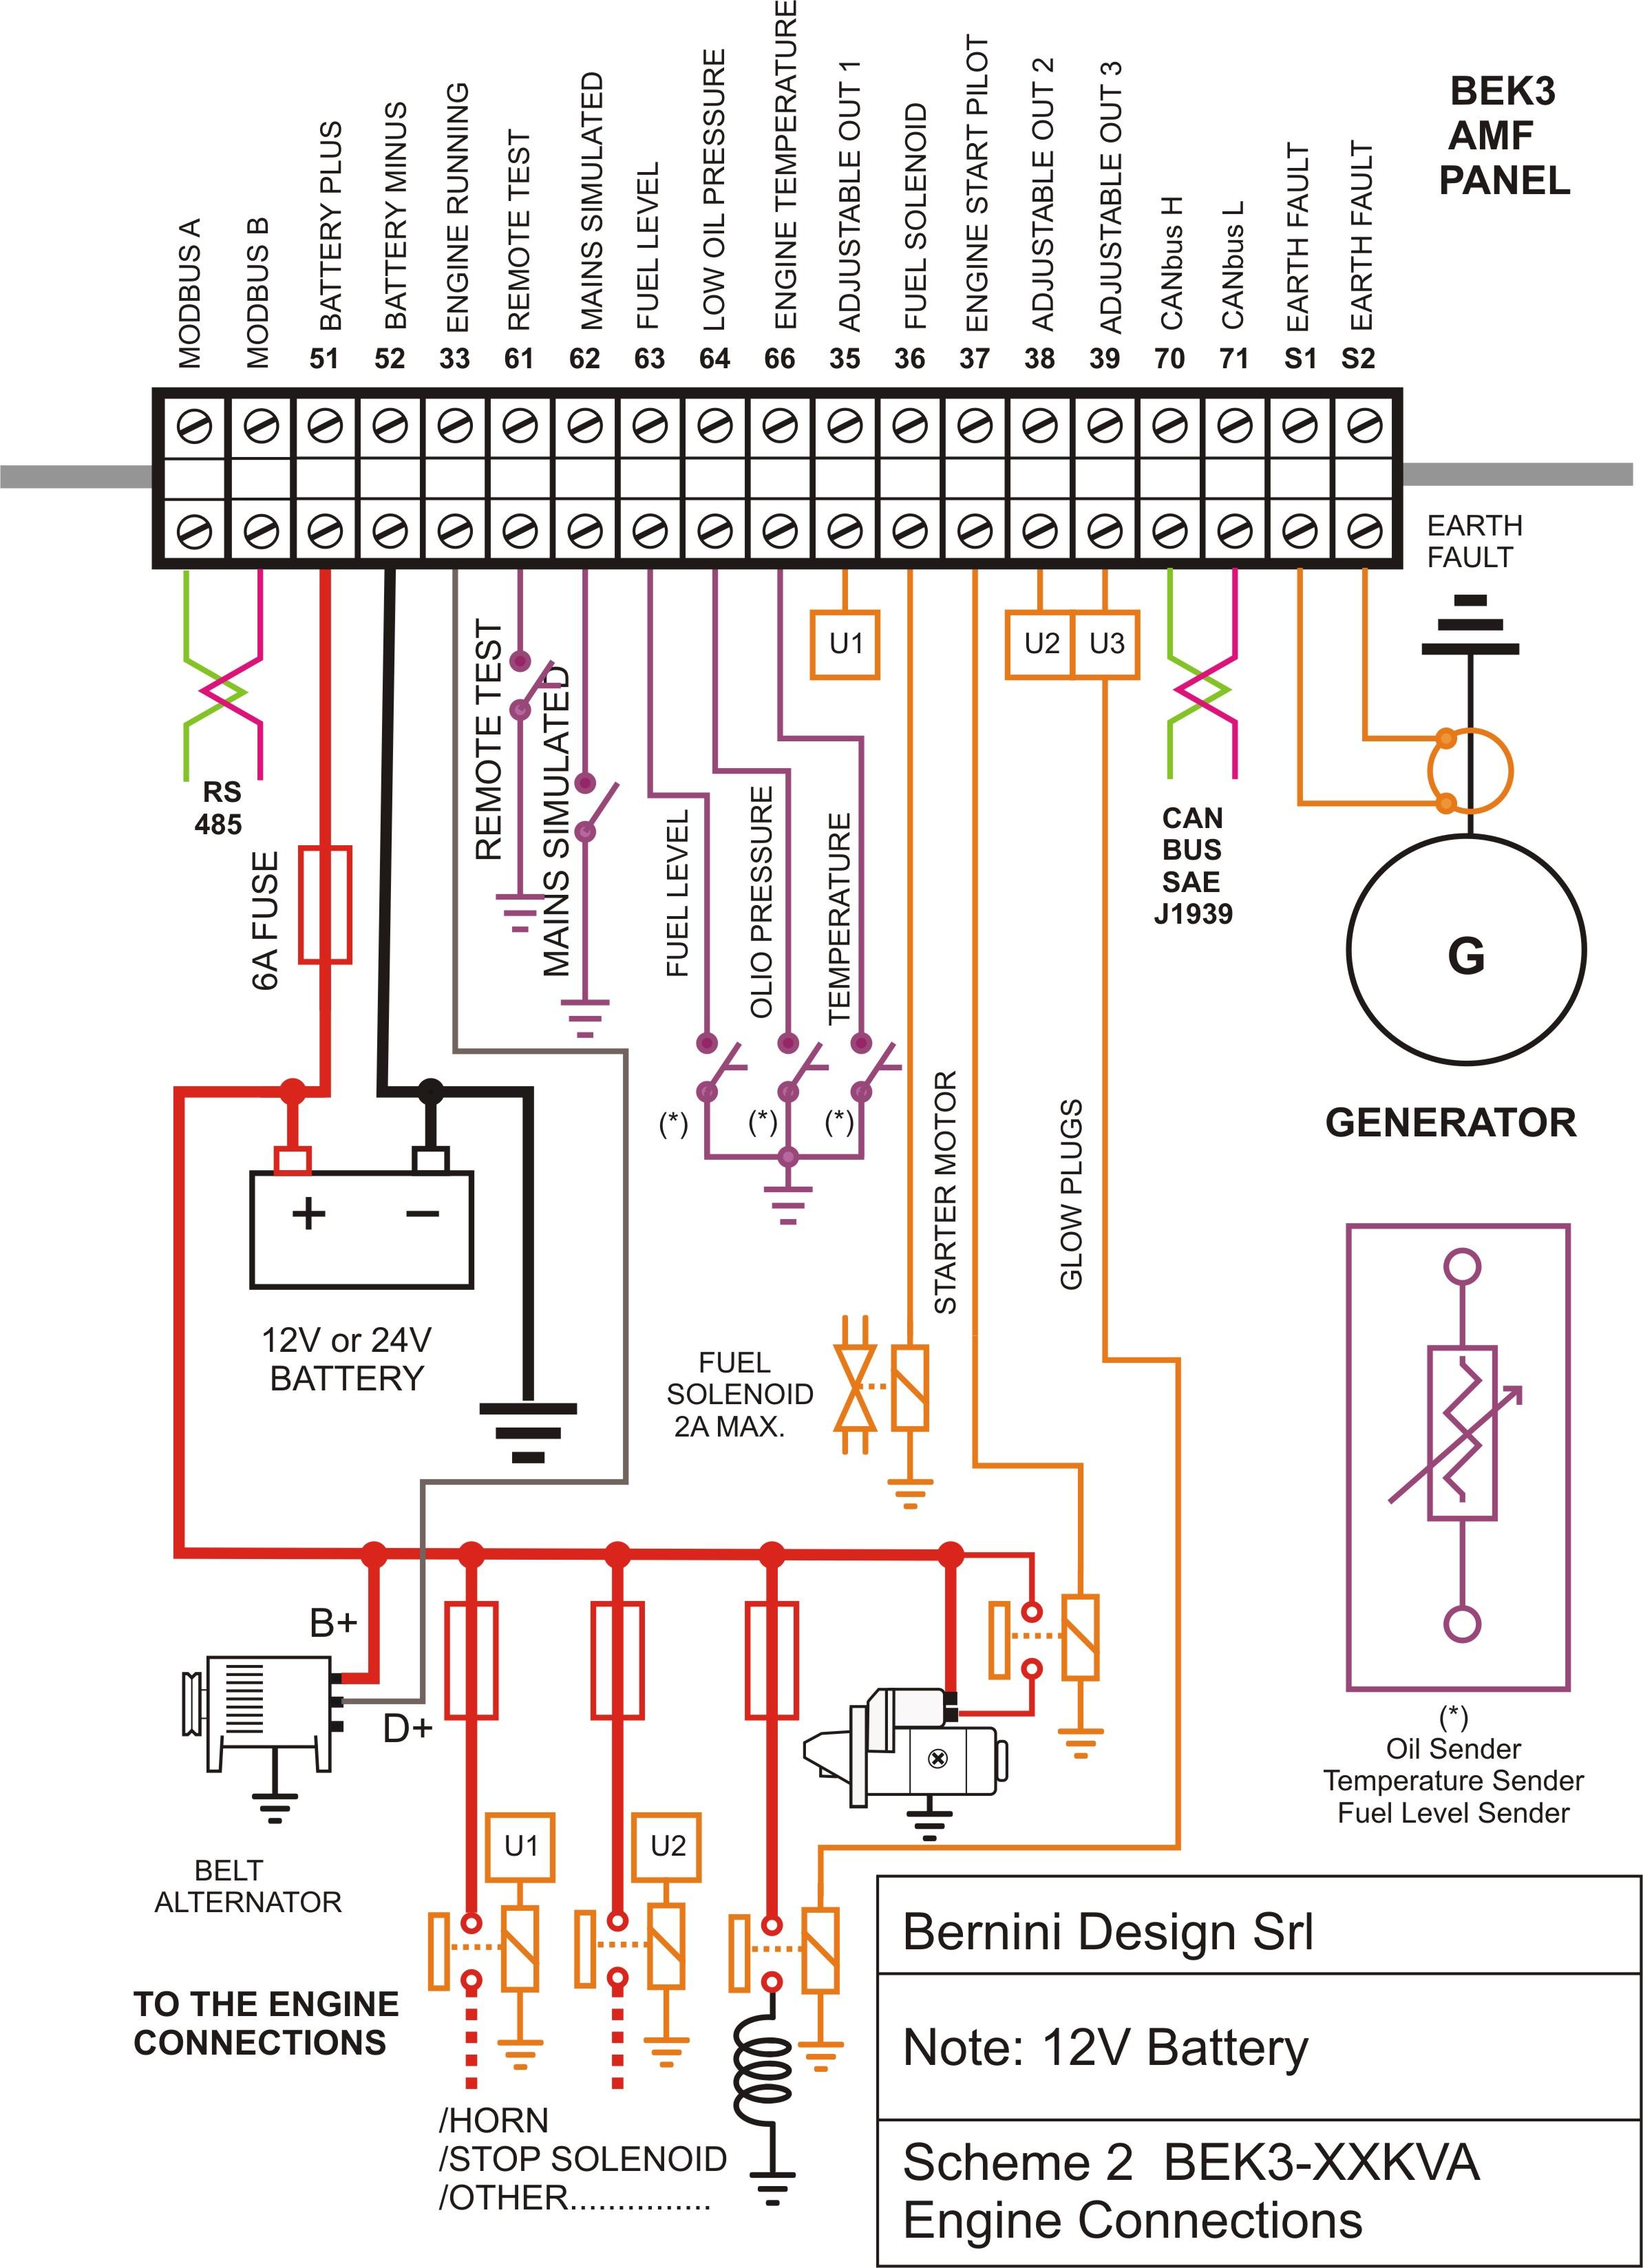 Astonishing Control Wiring Diagrams Wiring Diagram Data Wiring Cloud Eachirenstrafr09Org